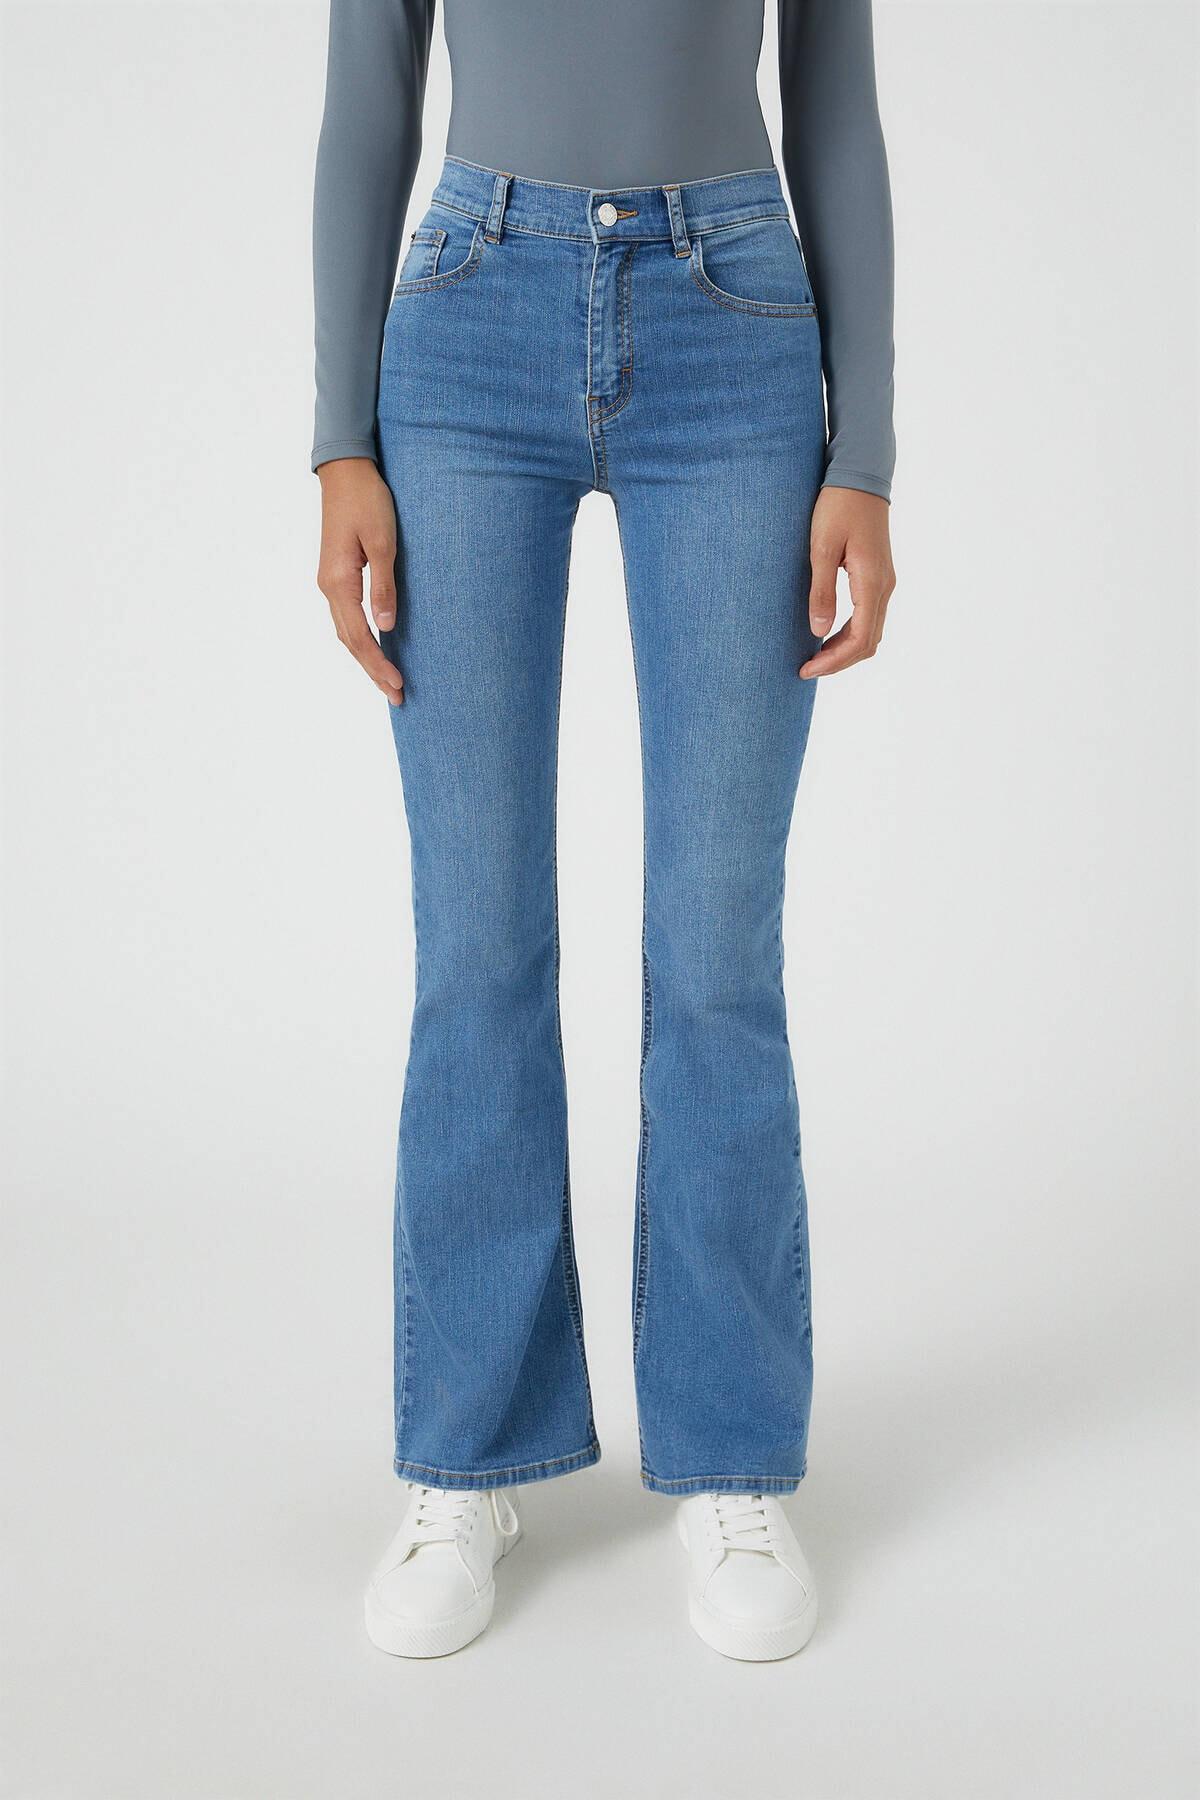 Pull & Bear Kadın Orta Mavi Basic İspanyol Paça Jean 09683303 2